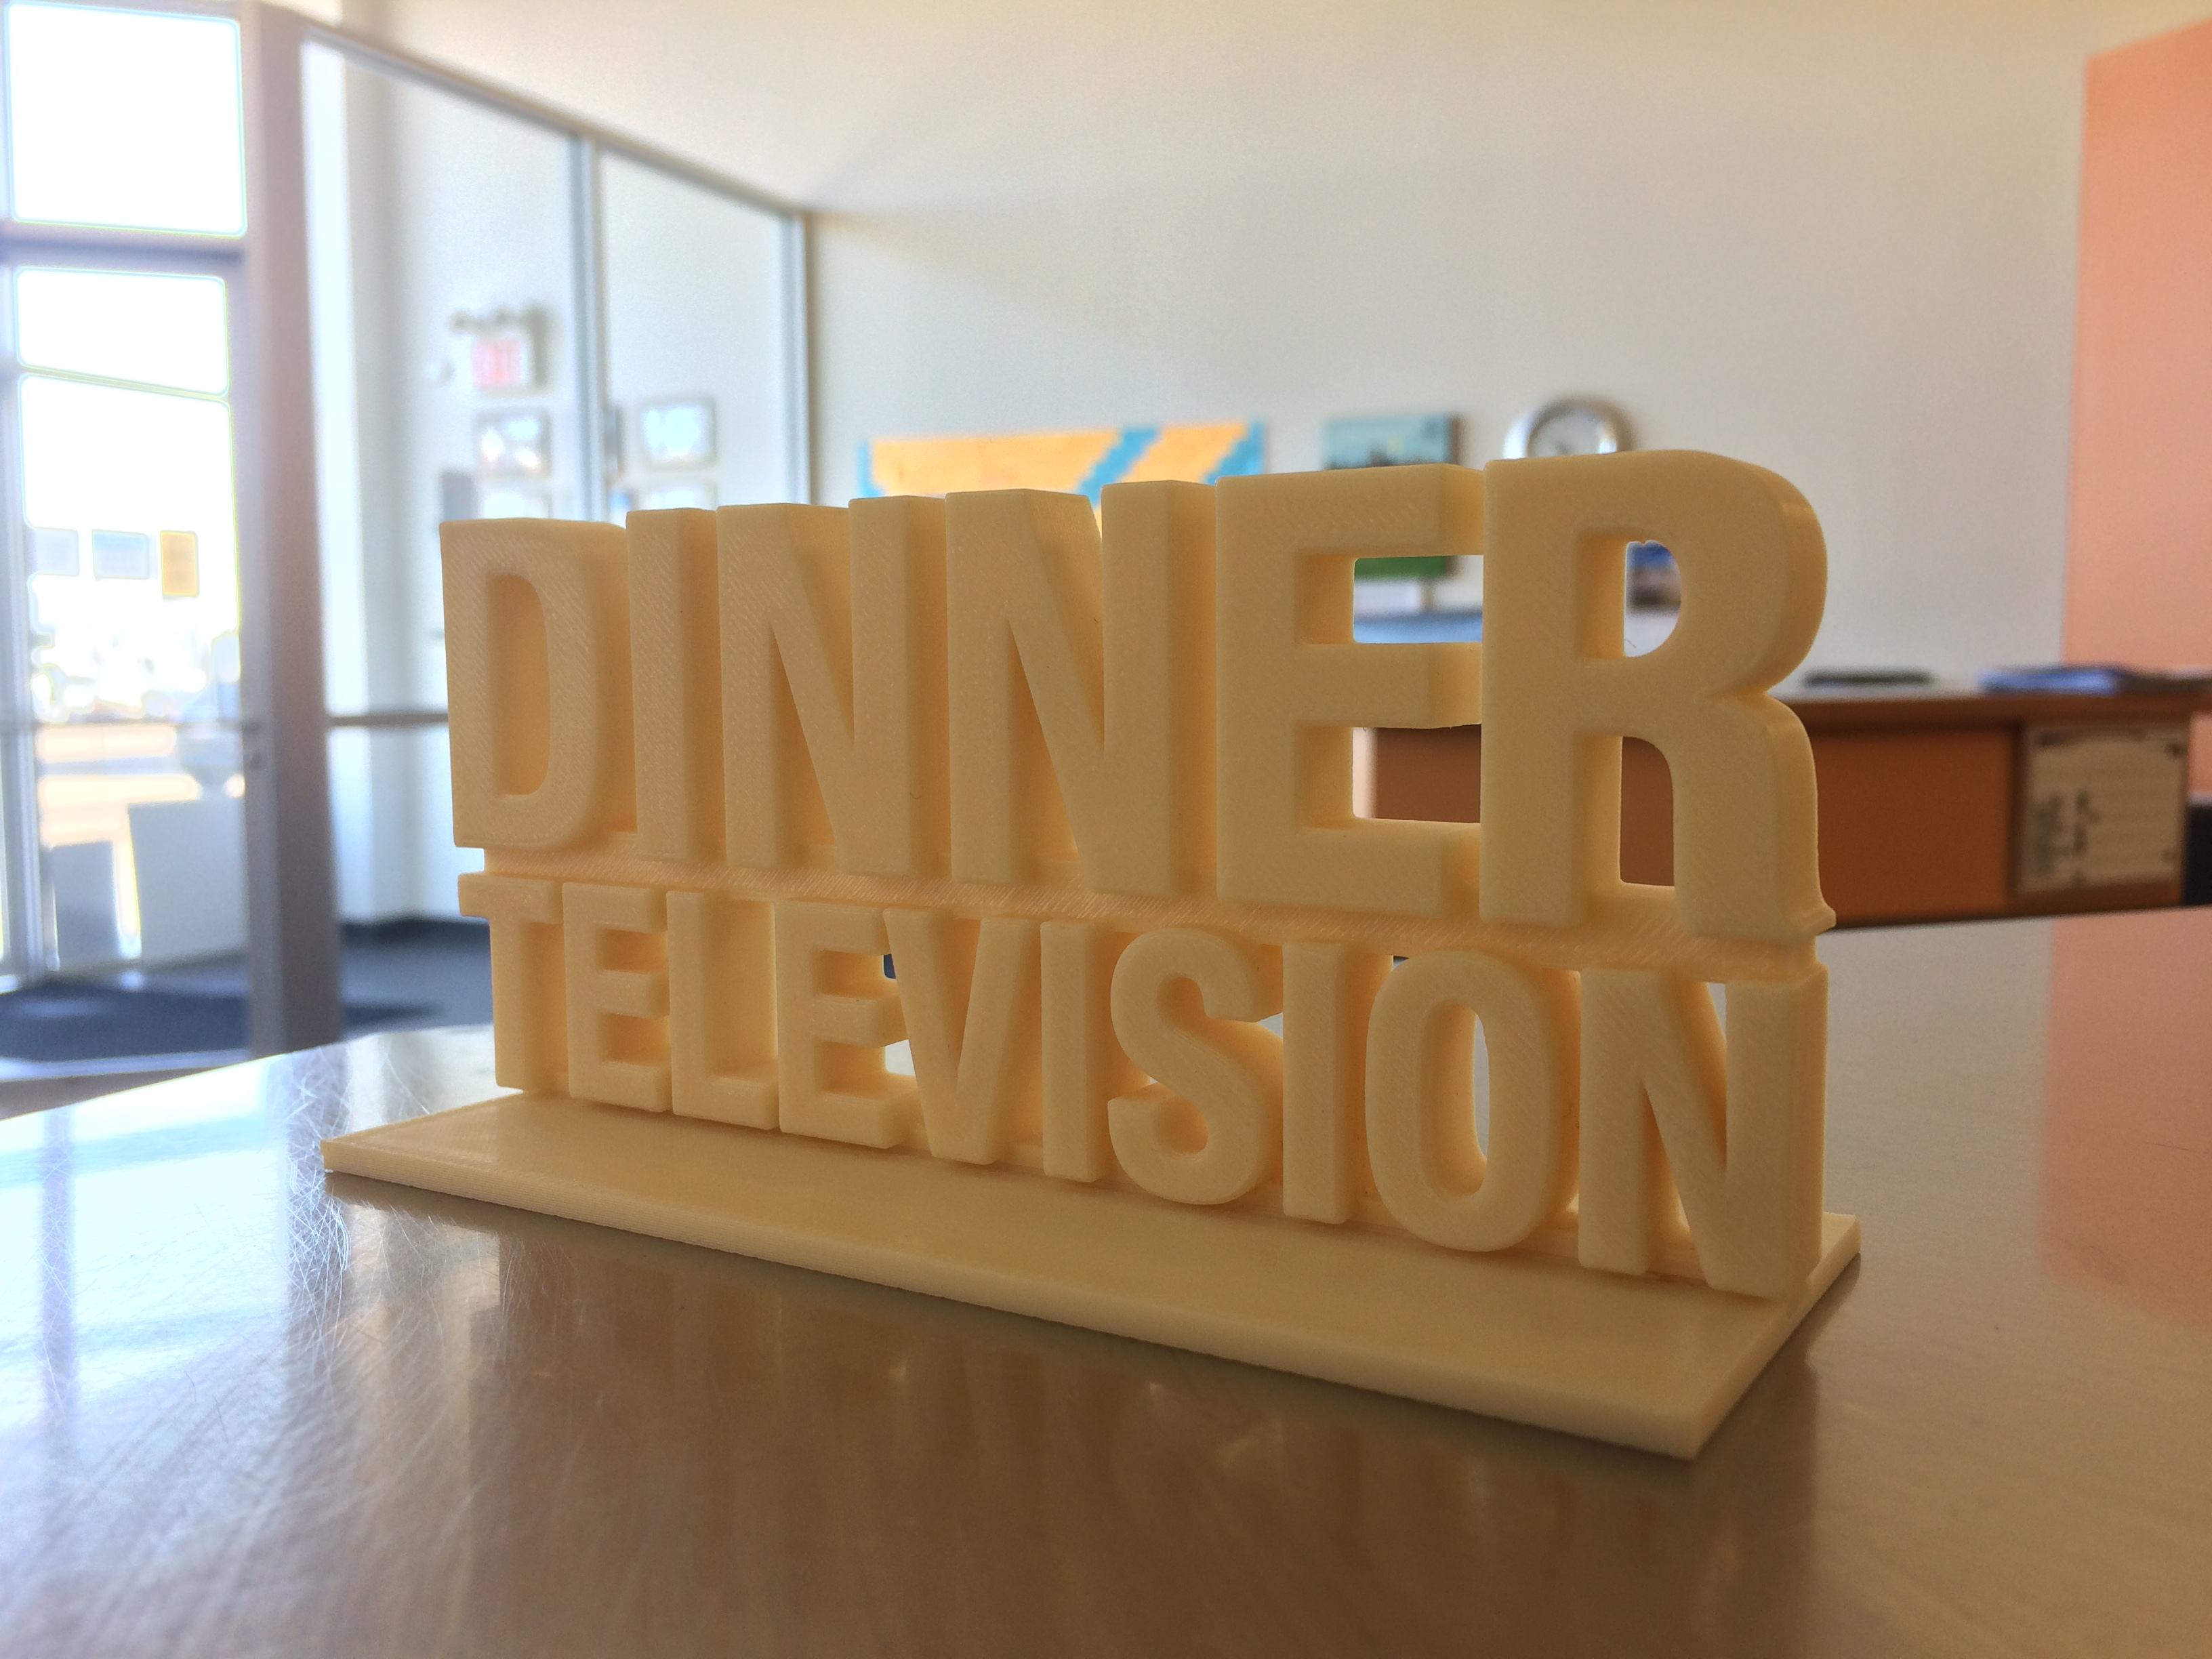 Dinner Television Logo